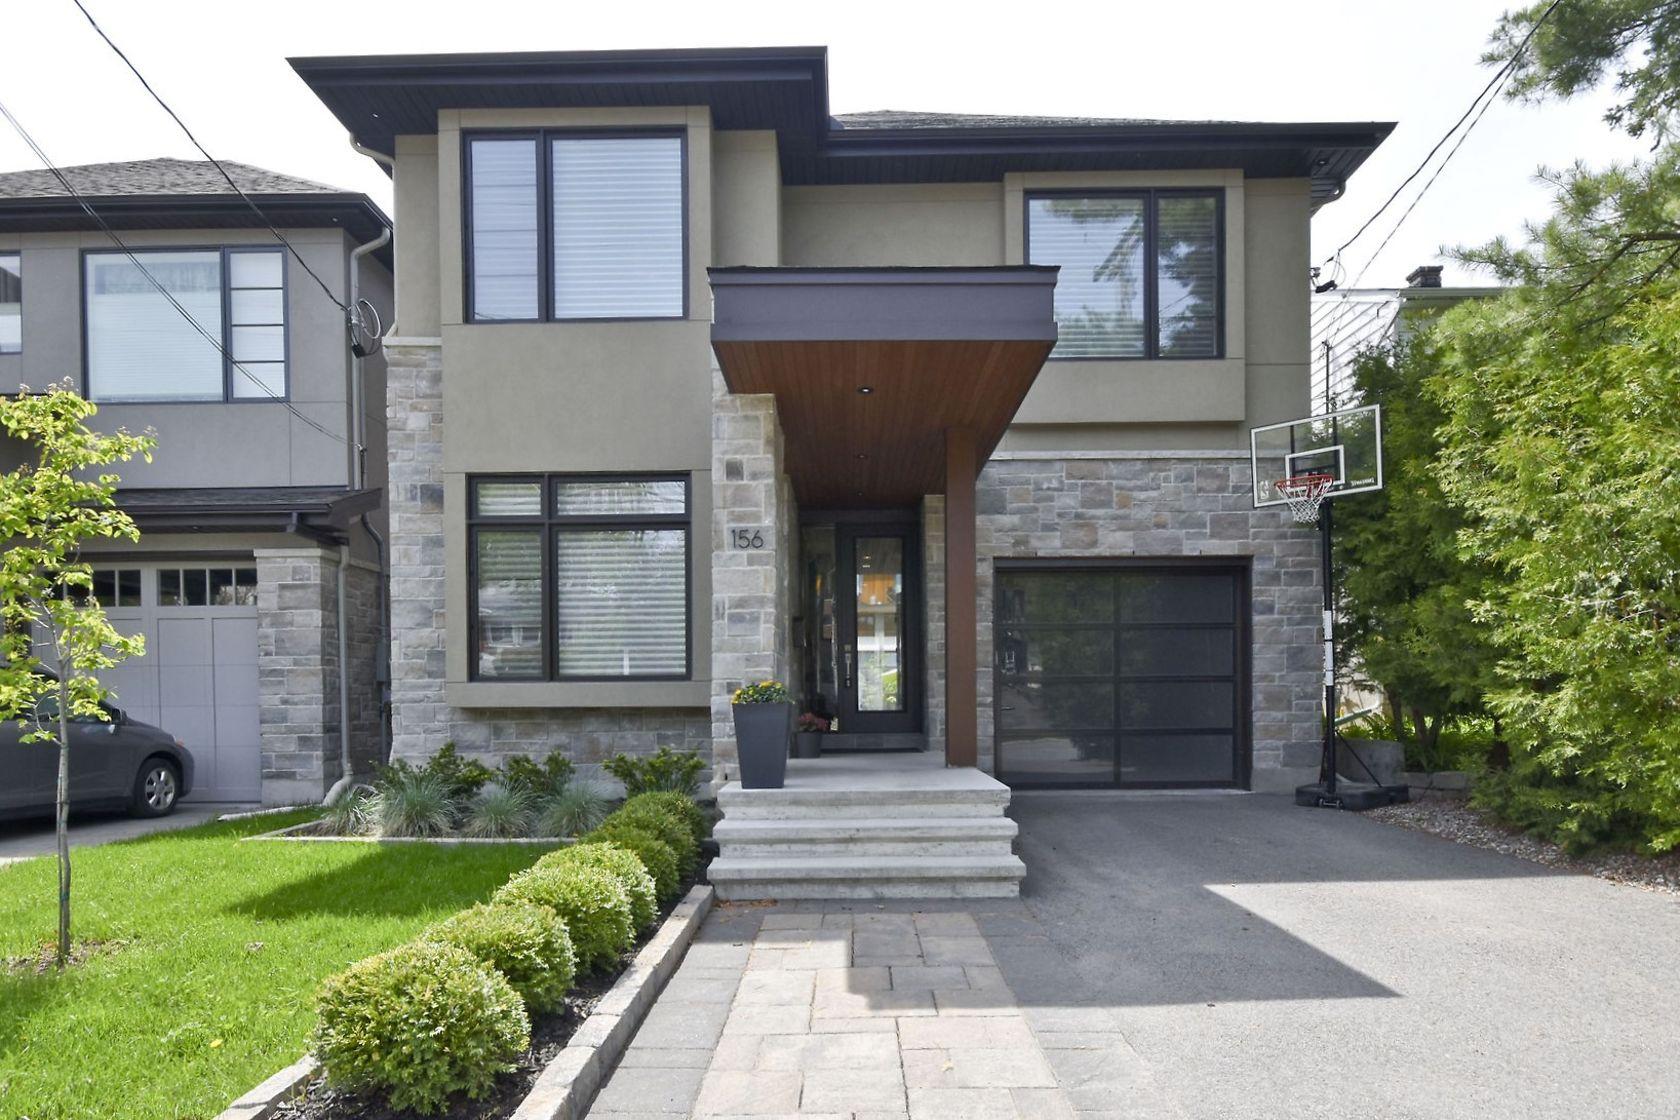 156 Northwestern Ave, Ottawa, Ontario  K1Y 0M2 - Photo 1 - RP7356401052